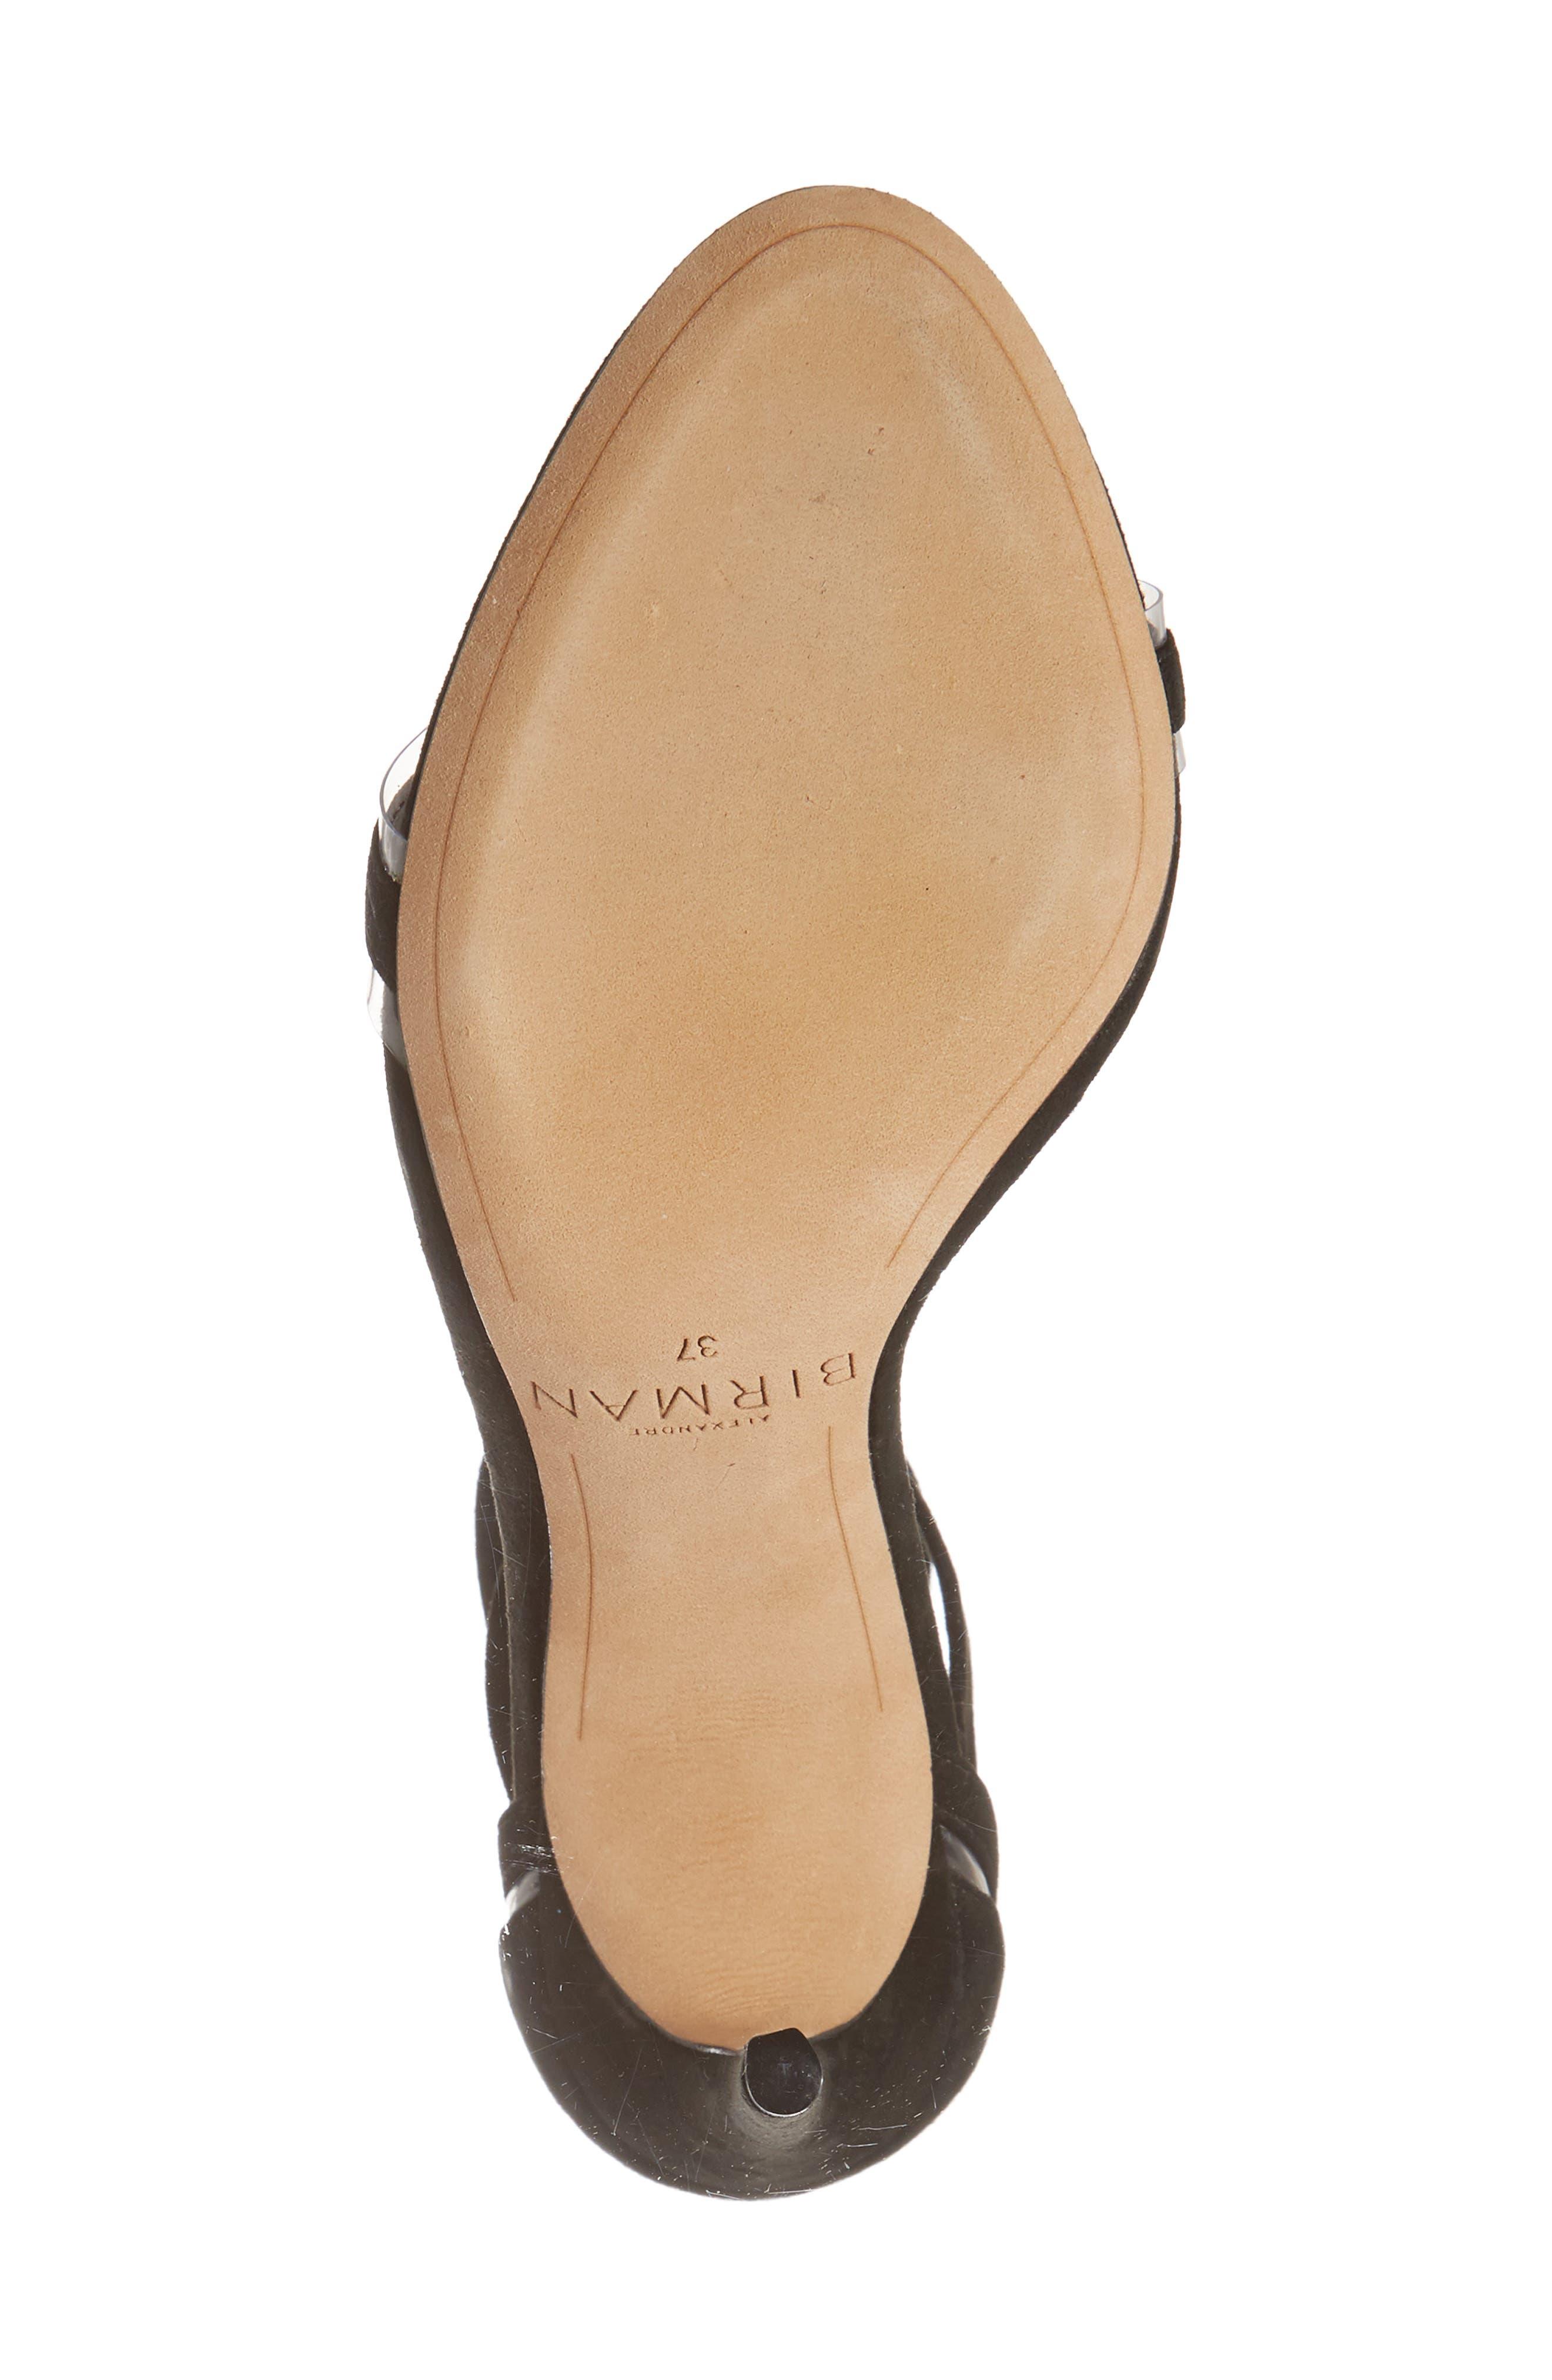 ALEXANDRE BIRMAN, Clarita Clear Ankle Tie Sandal, Alternate thumbnail 6, color, BLACK/ TRANSPARENT